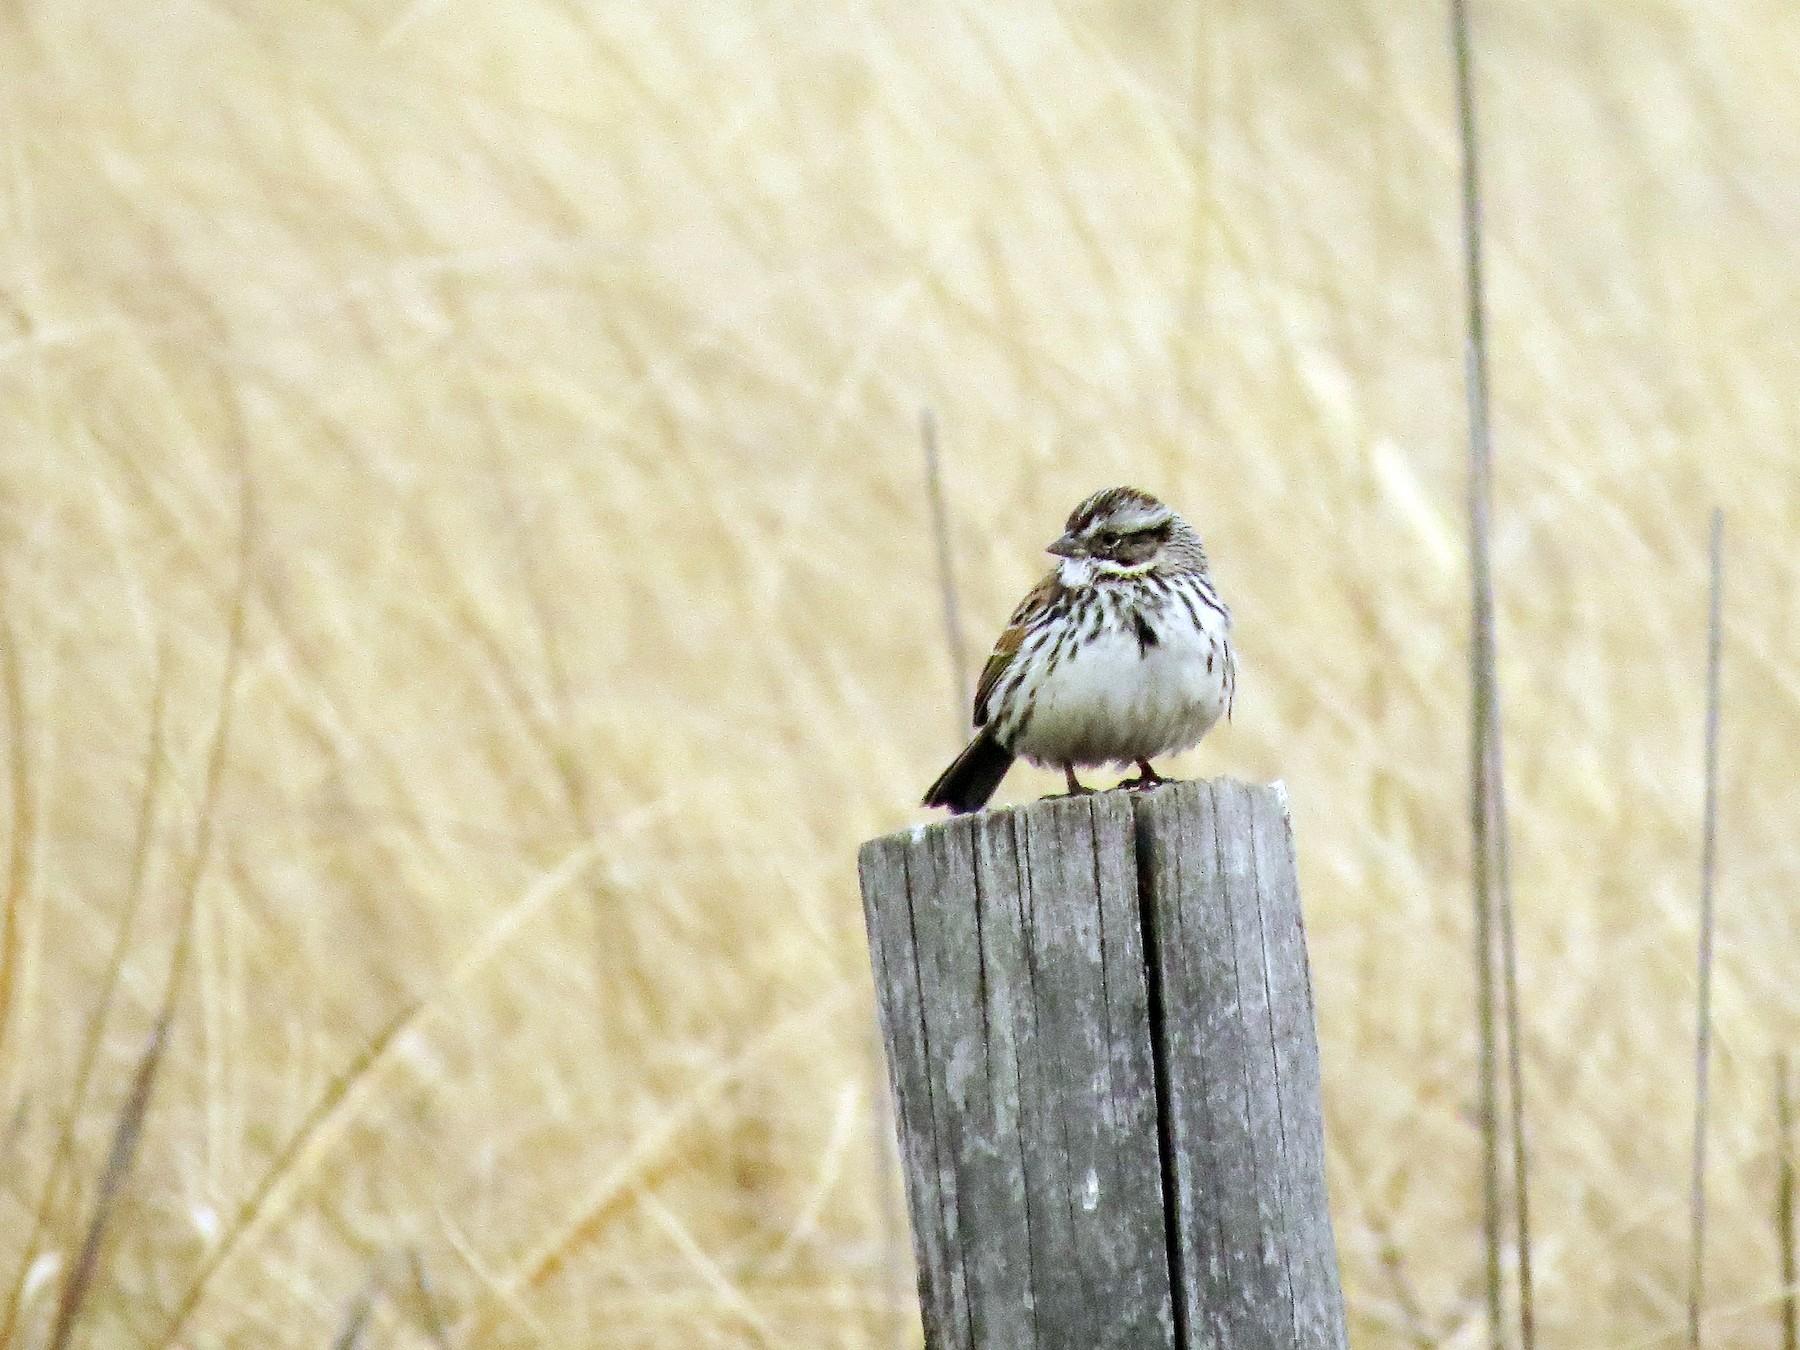 Sierra Madre Sparrow - Jason Fidorra